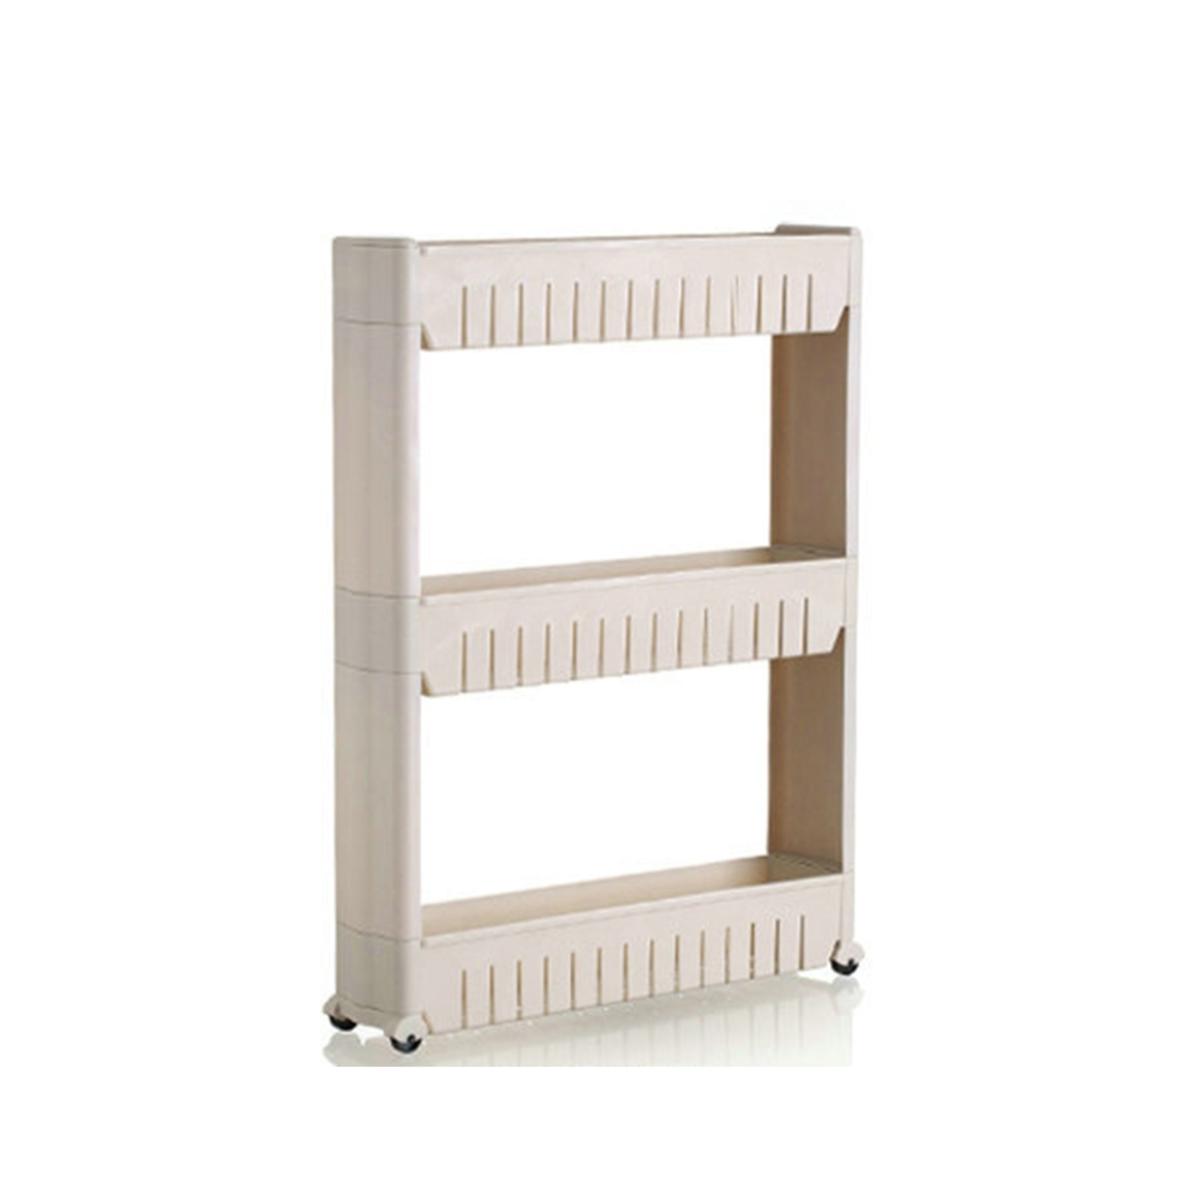 3 Tiers narrow organizer rack - HG137203GY (Gray)